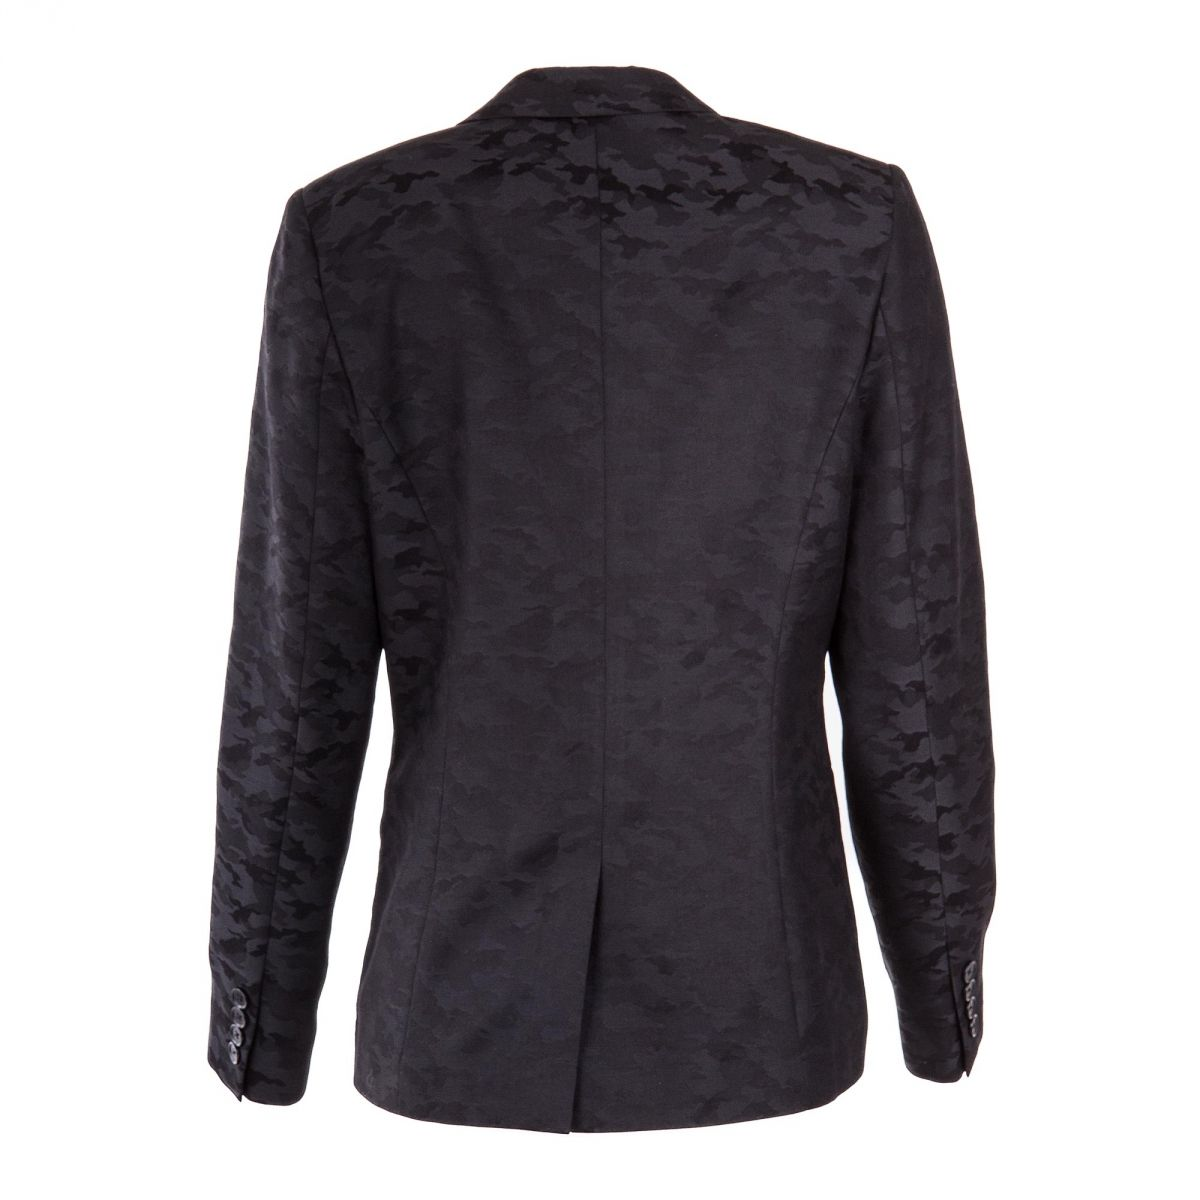 blazer noir imprim camouflage femme best mountain prix d griff. Black Bedroom Furniture Sets. Home Design Ideas